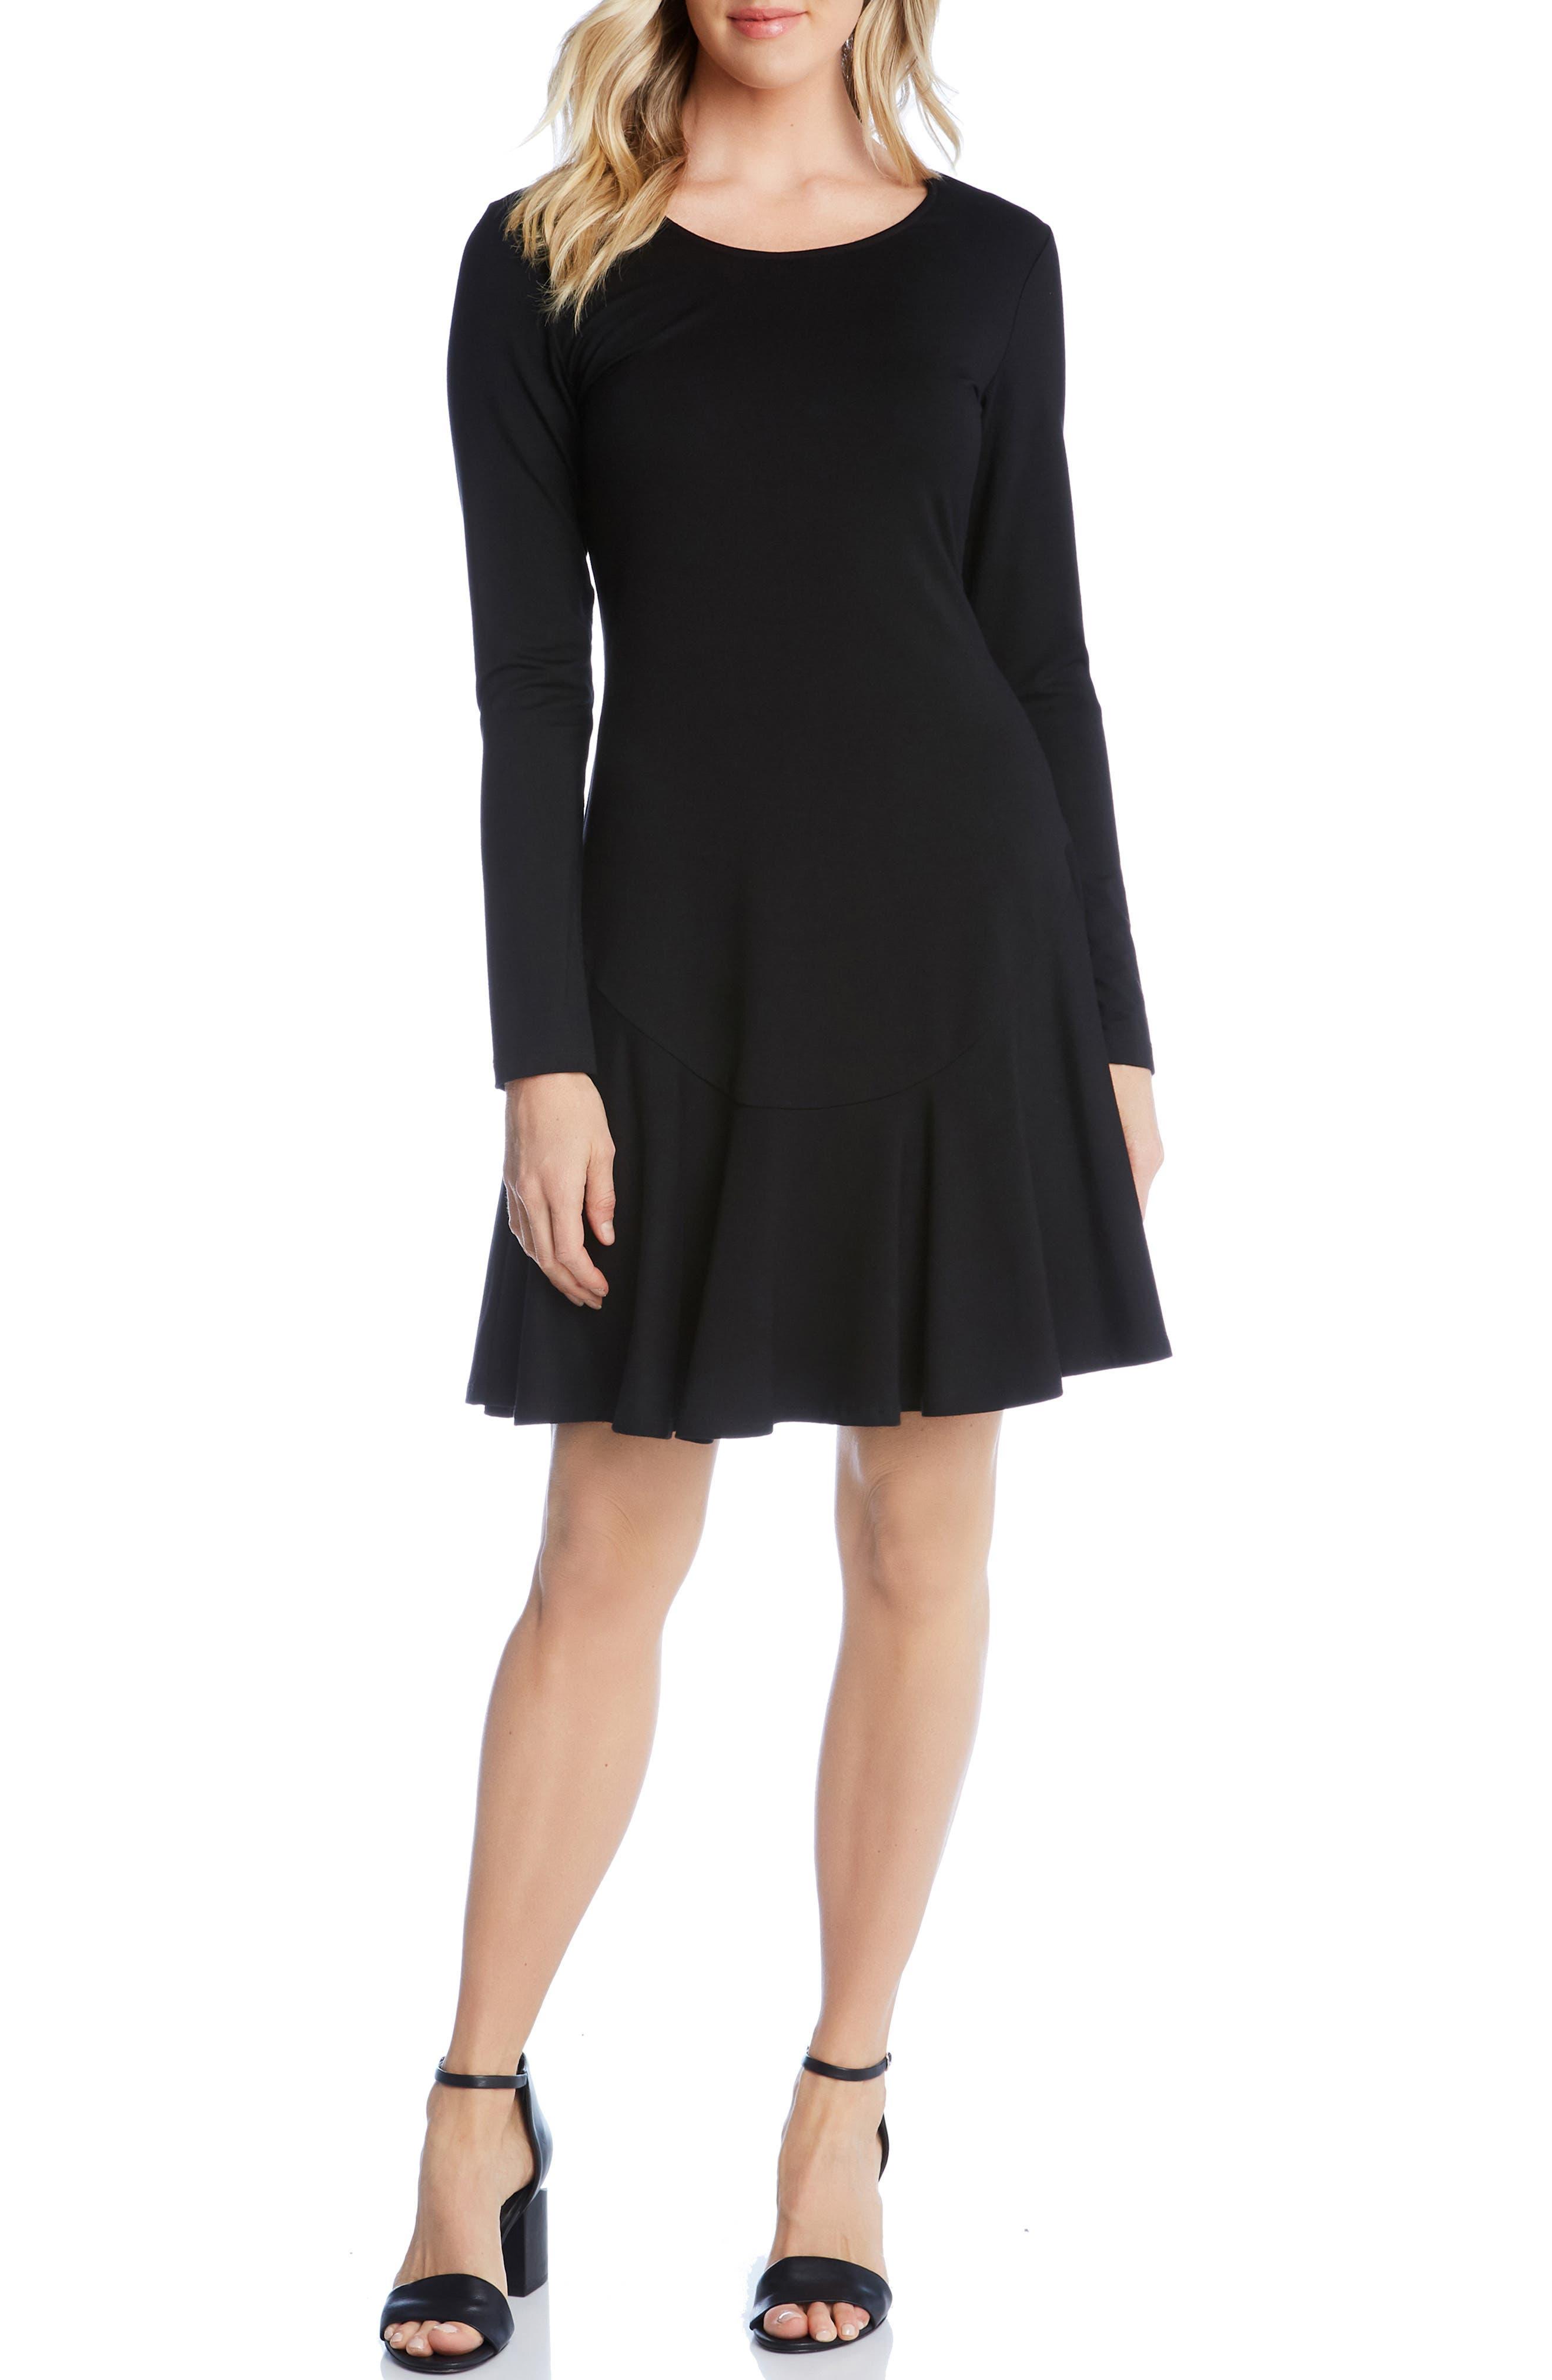 KAREN KANE, Dakota Ruffle Hem A-Line Dress, Main thumbnail 1, color, BLACK